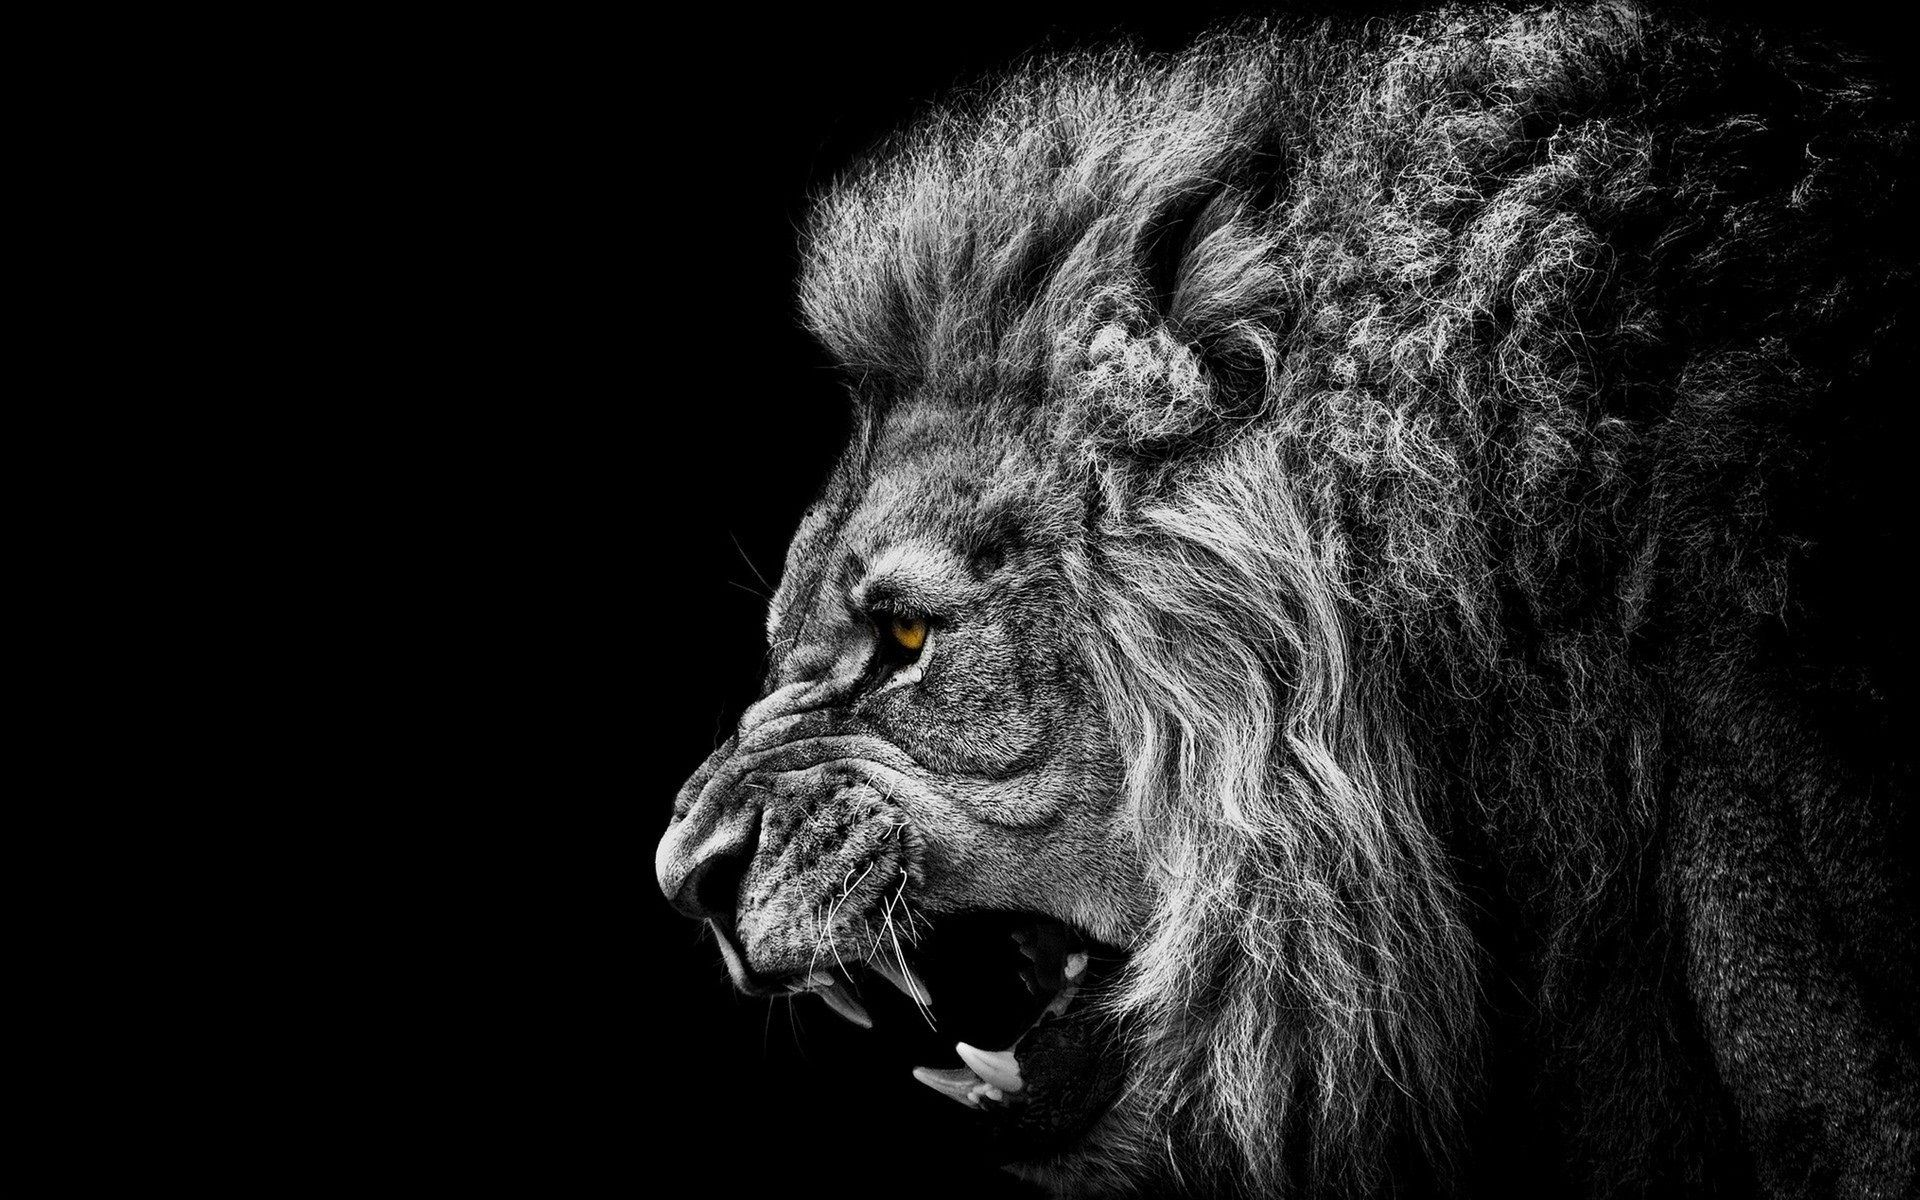 Cool Wallpaper roar desktop wallpaper | lion roar pictures | cool wallpapers